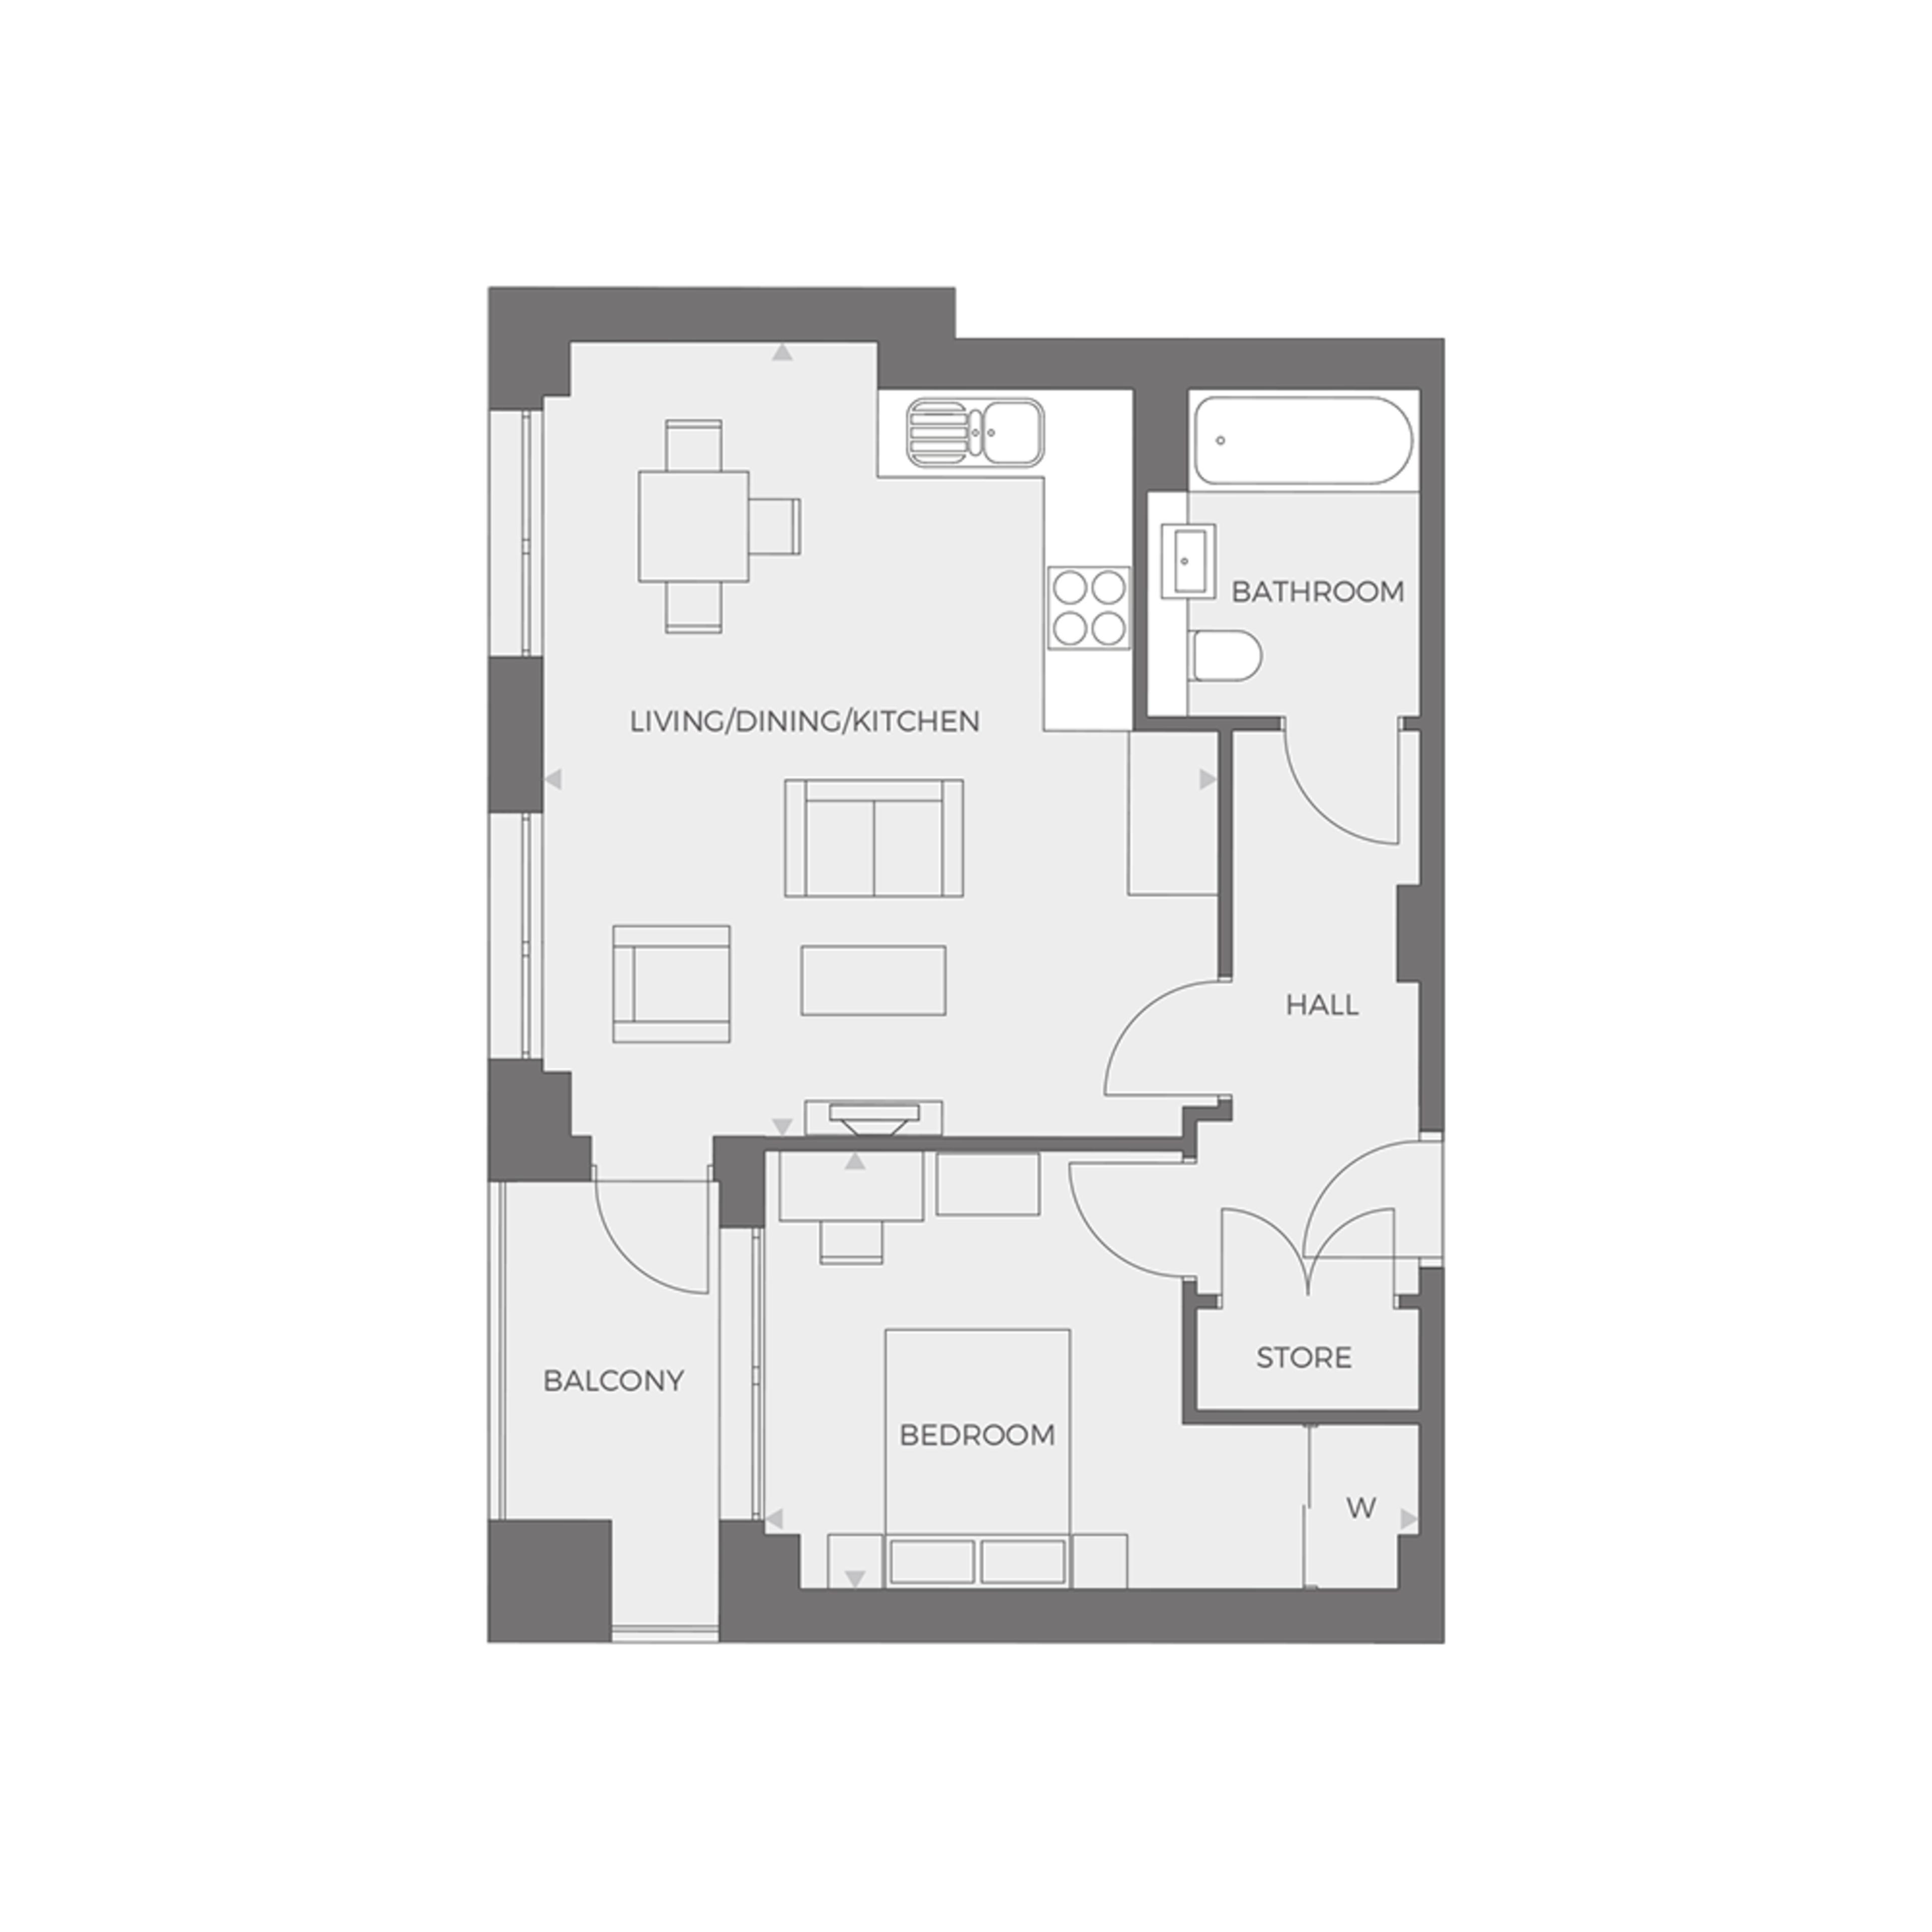 RUB1X - 1 bed Type H floor plan